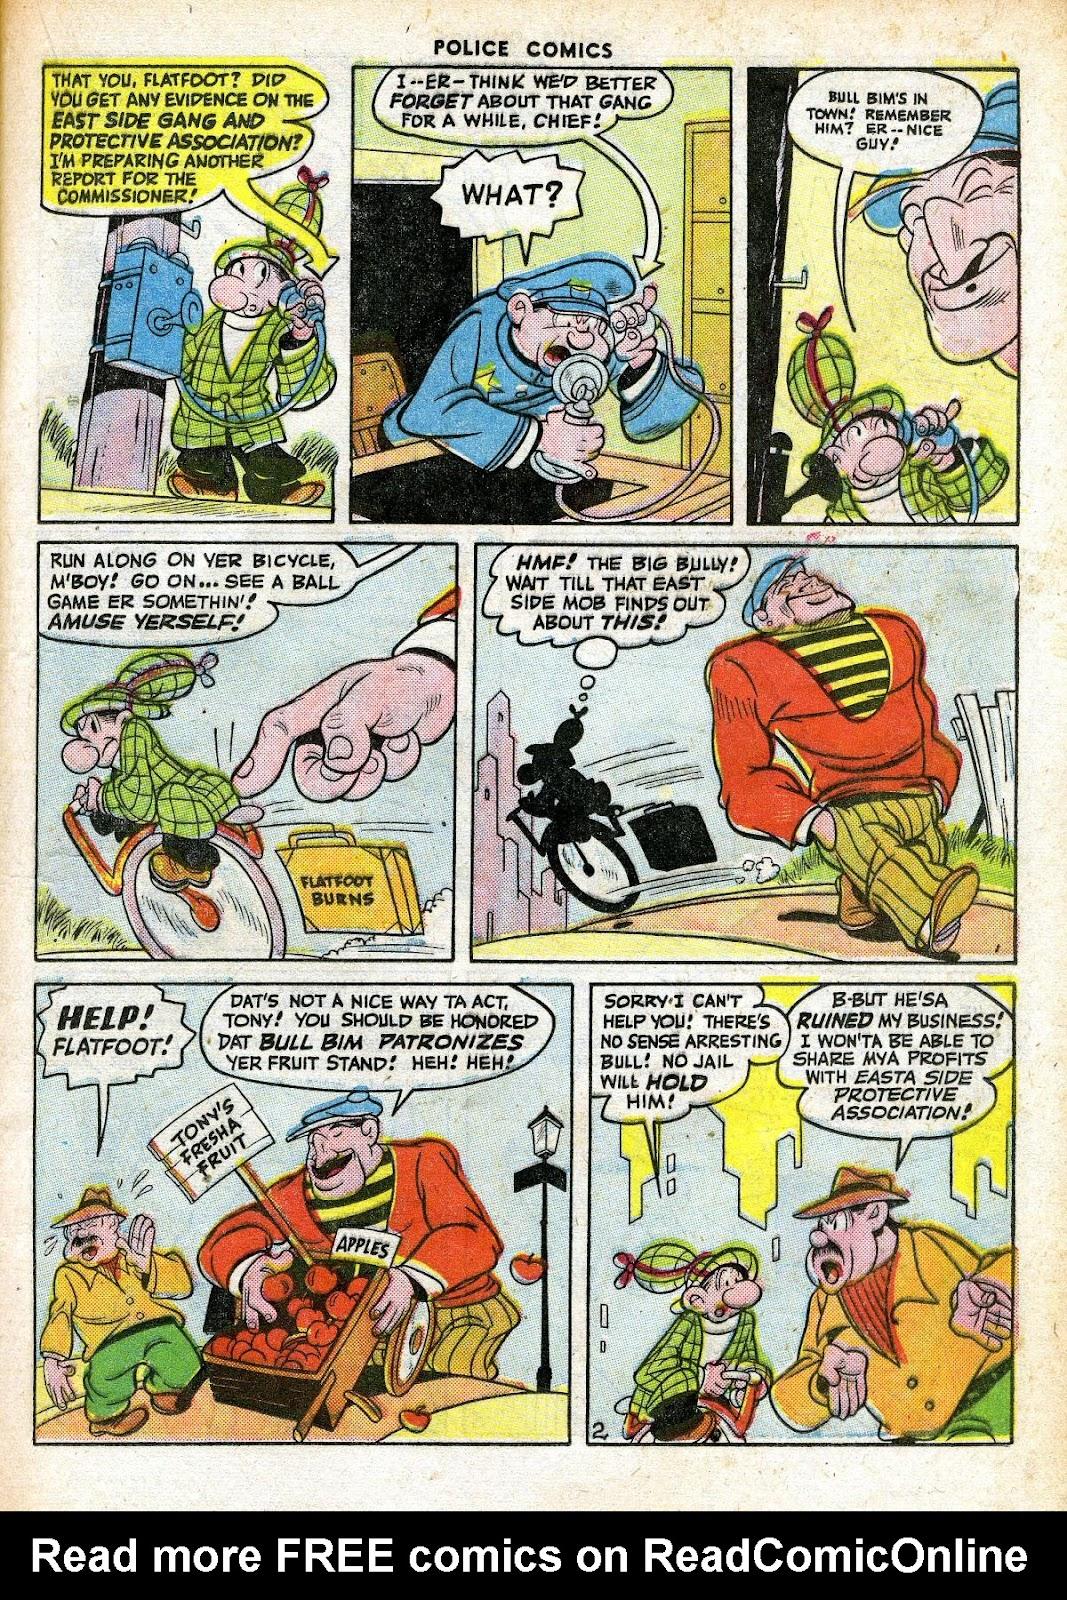 Comic Police Comics issue 63